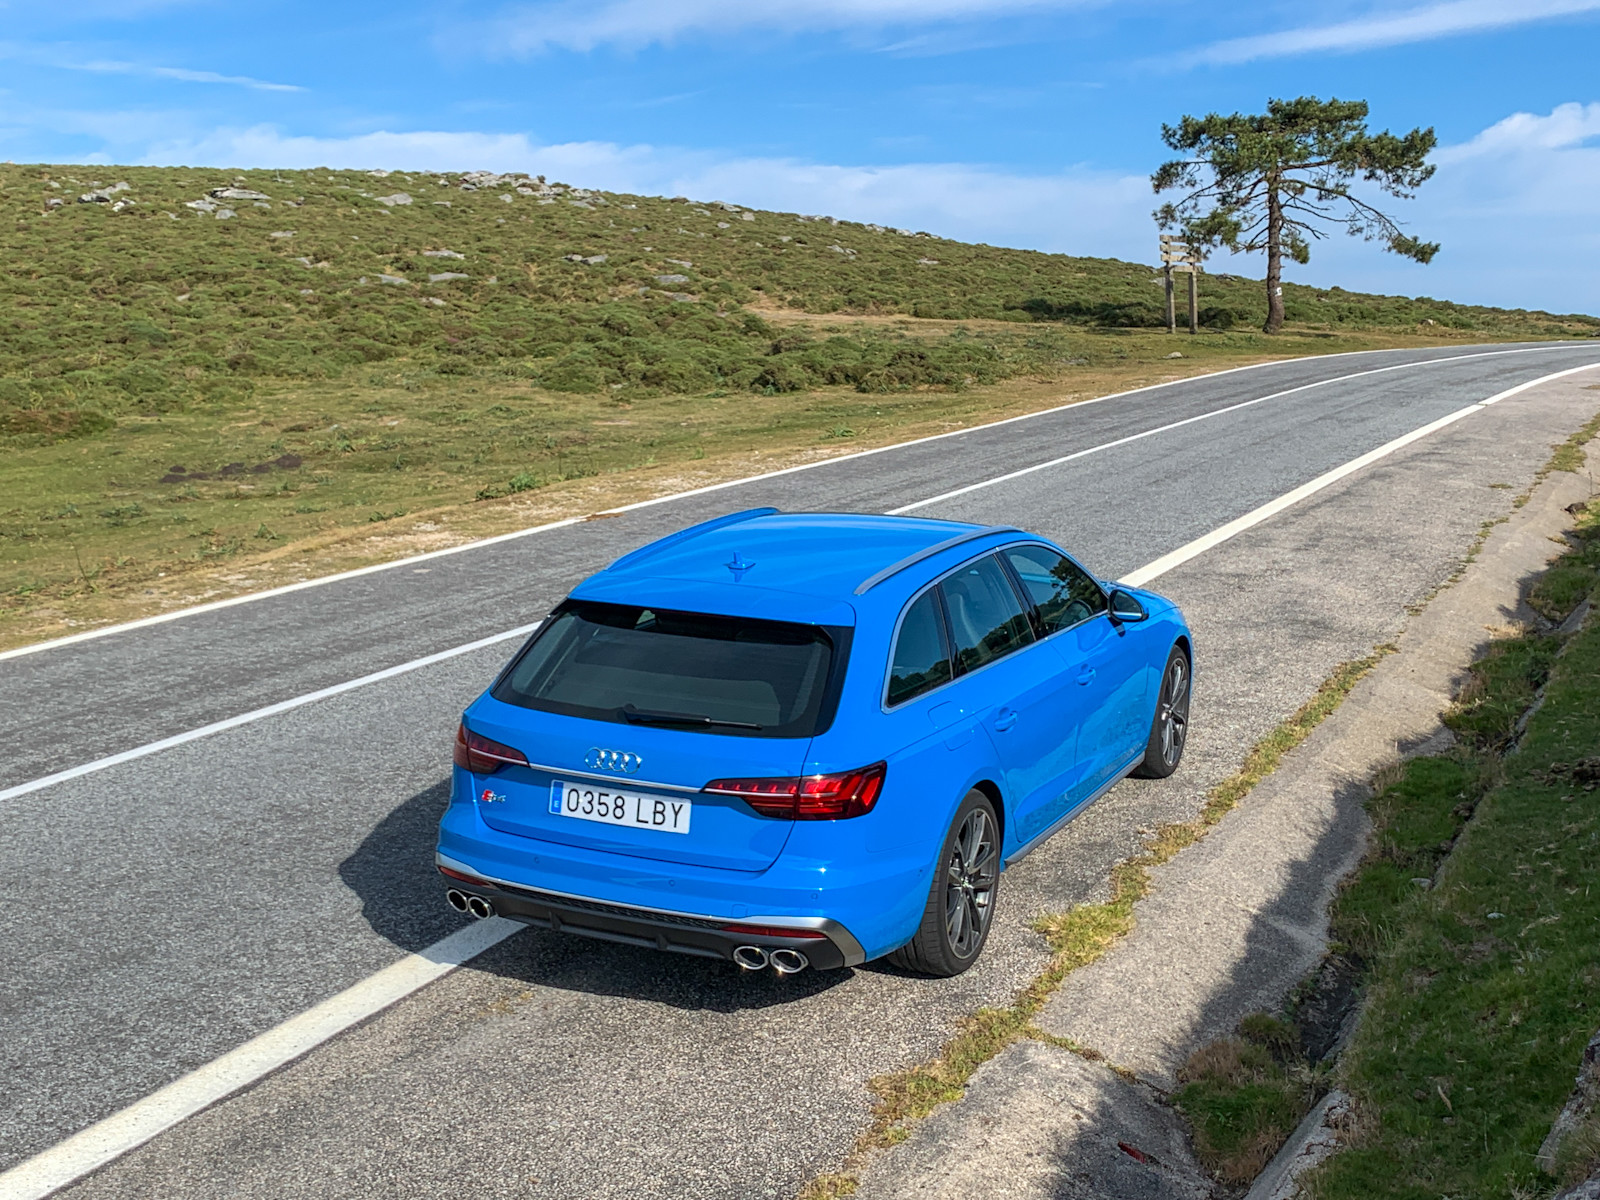 Foto de Audi S4 Avant 2020 (prueba) (5/26)